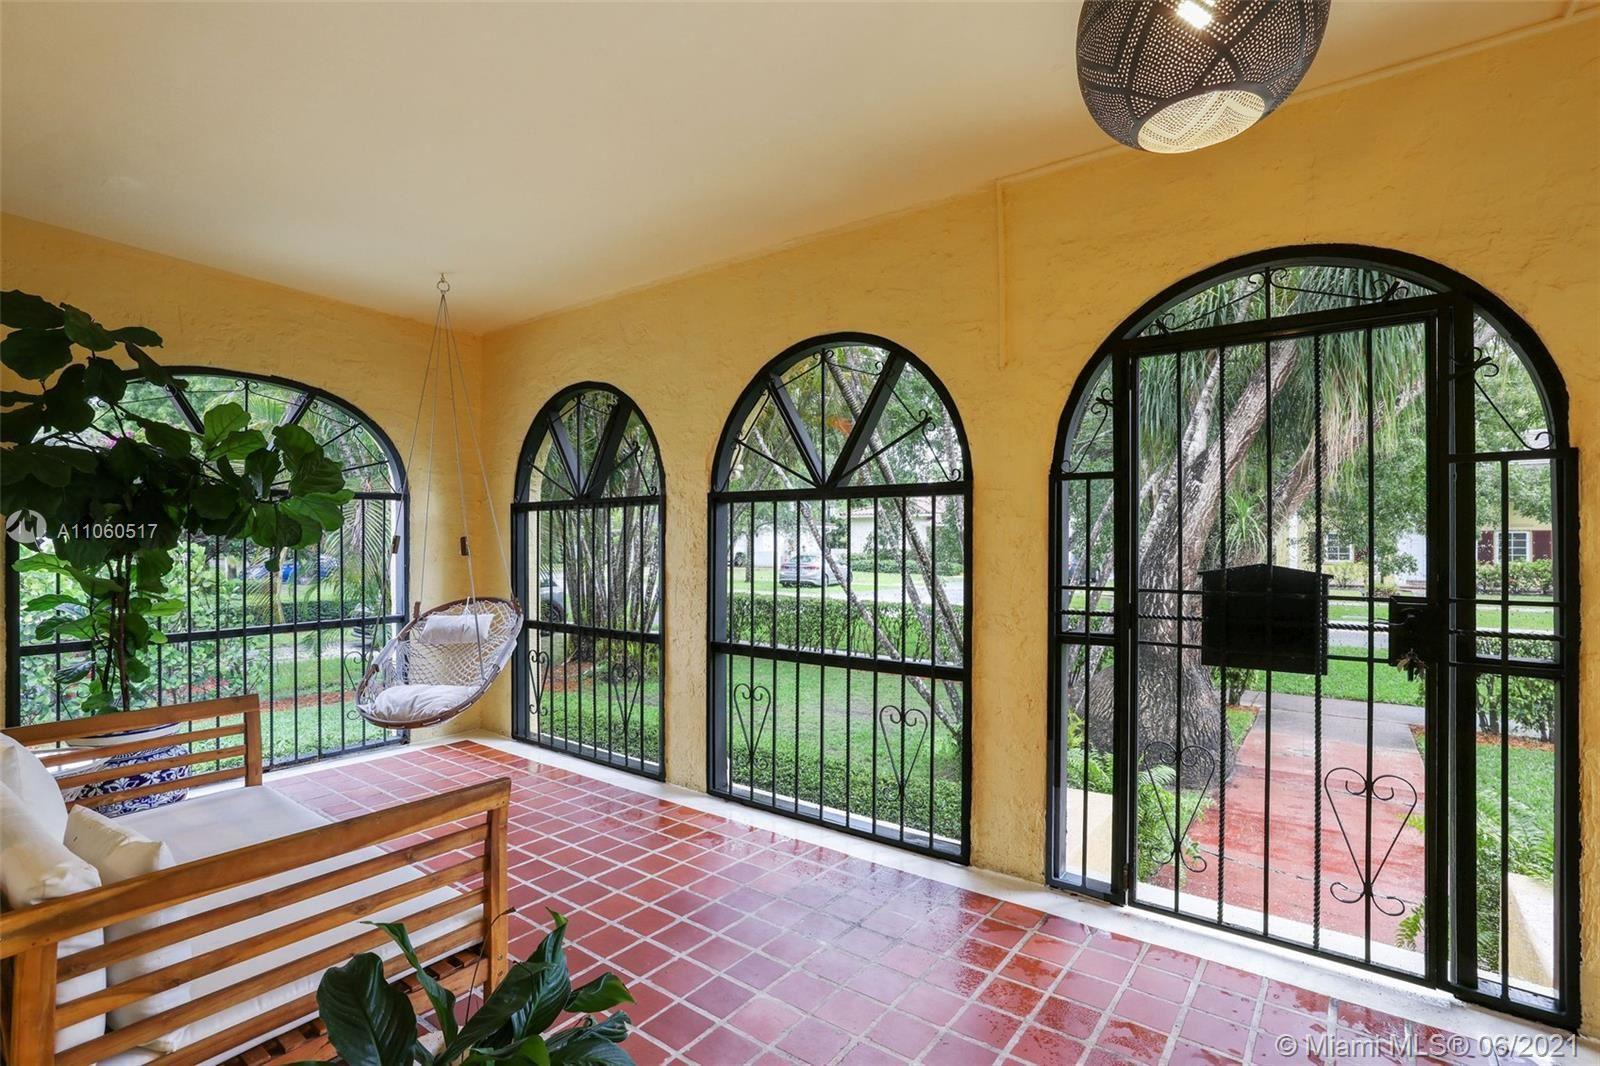 Photo of 547 Alcazar Ave, Coral Gables, FL 33134 (MLS # A11060517)